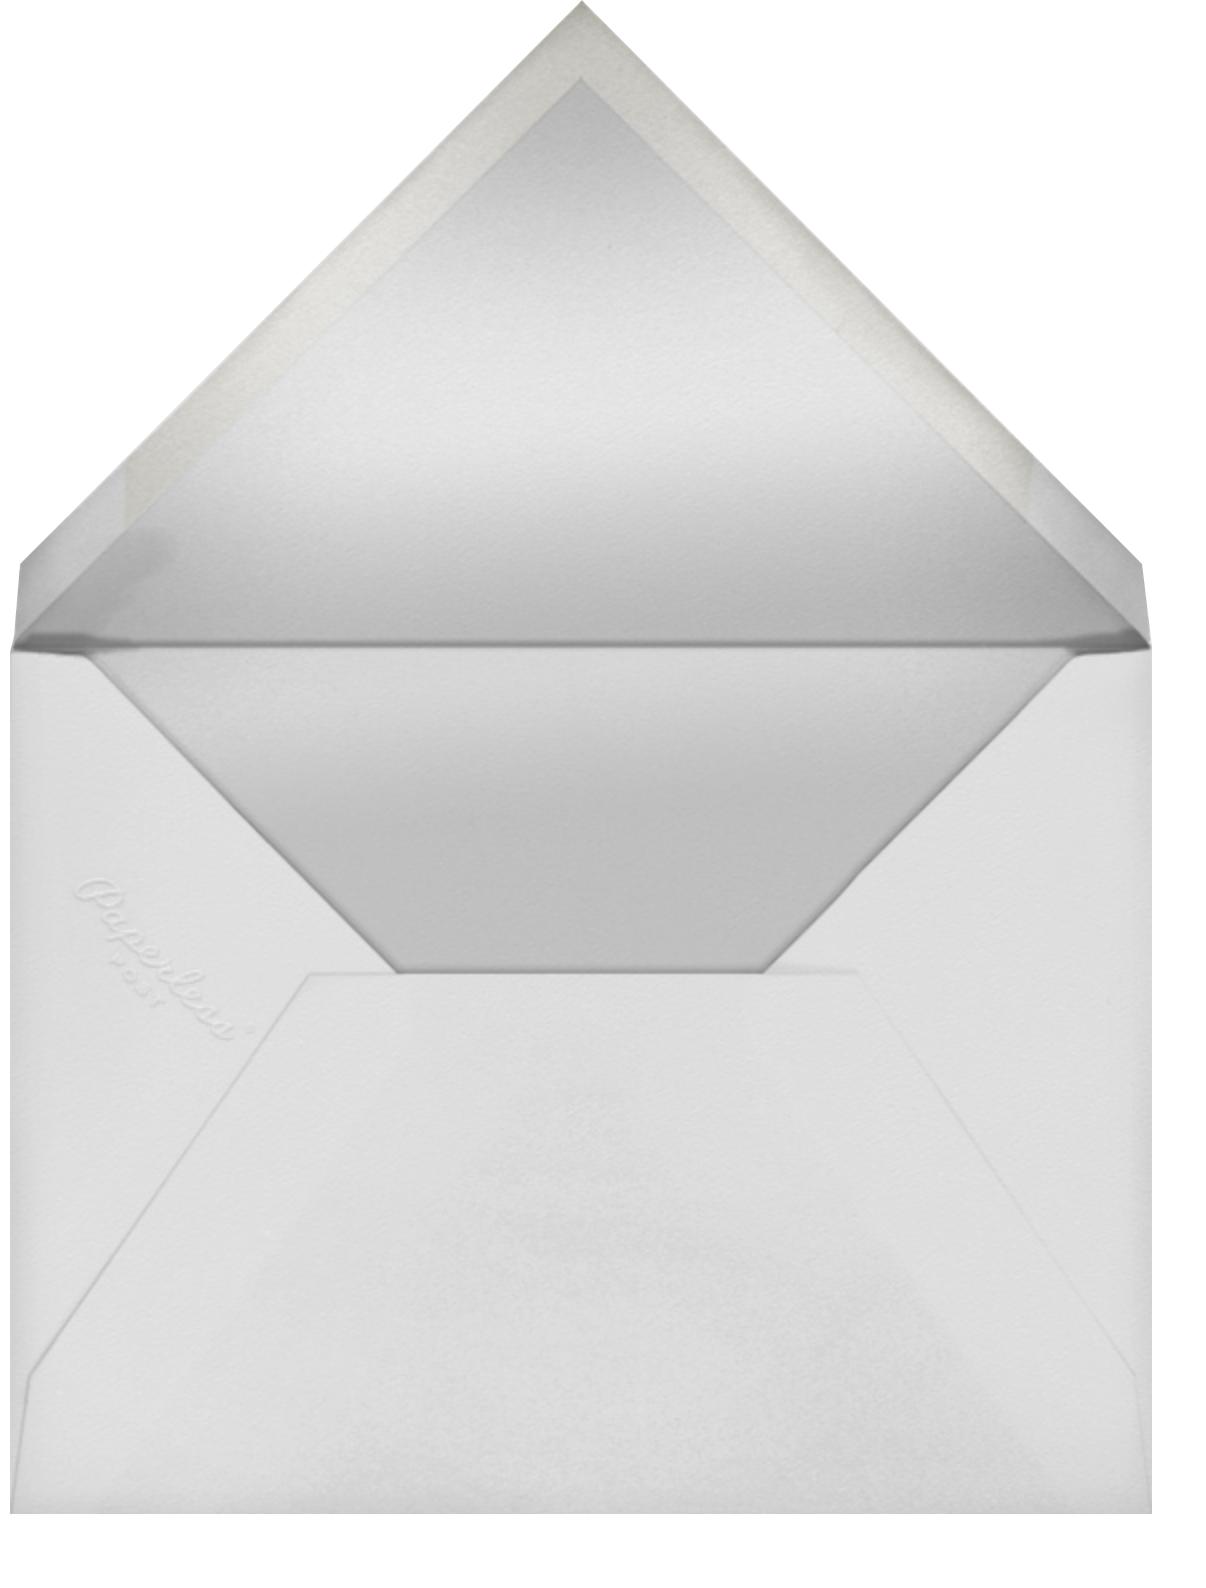 Gradient Bars - Pink - Paperless Post - Bachelorette party - envelope back